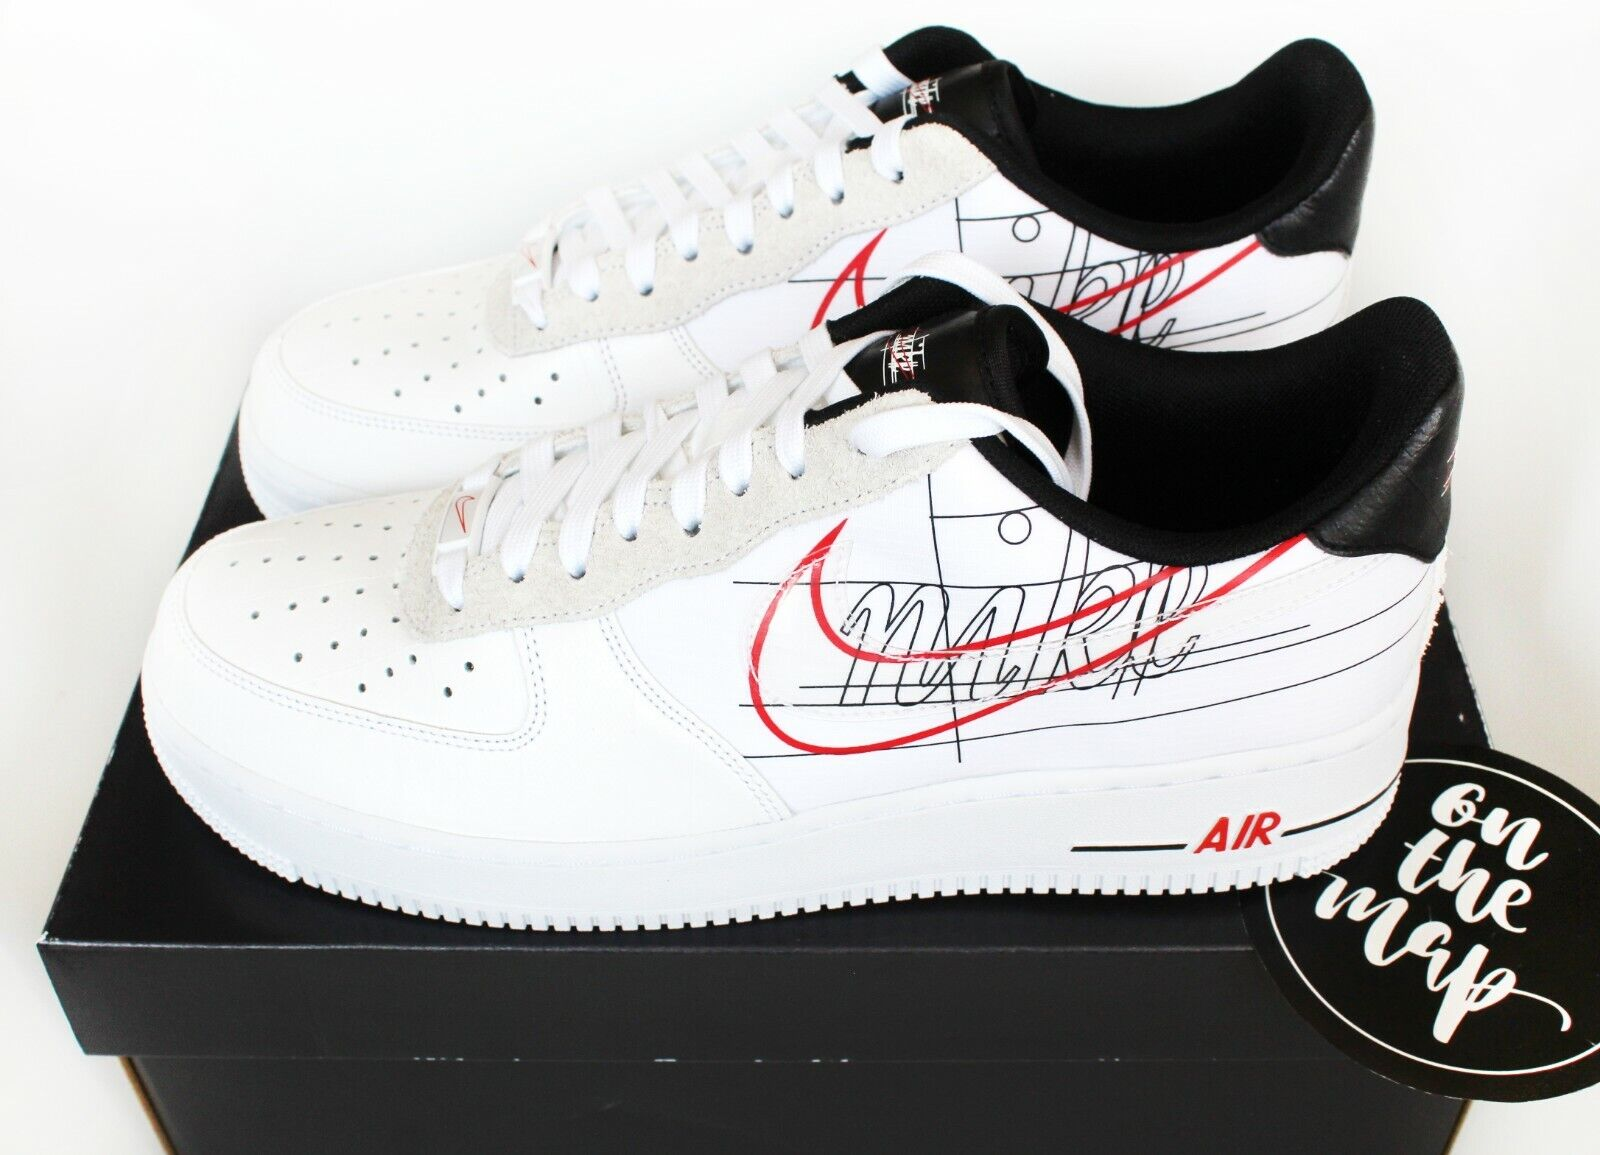 Nike Air Force 1 AF1 '07 LV8 Script Swoosh Pack White UK 5 7 8 9 10 11 US New